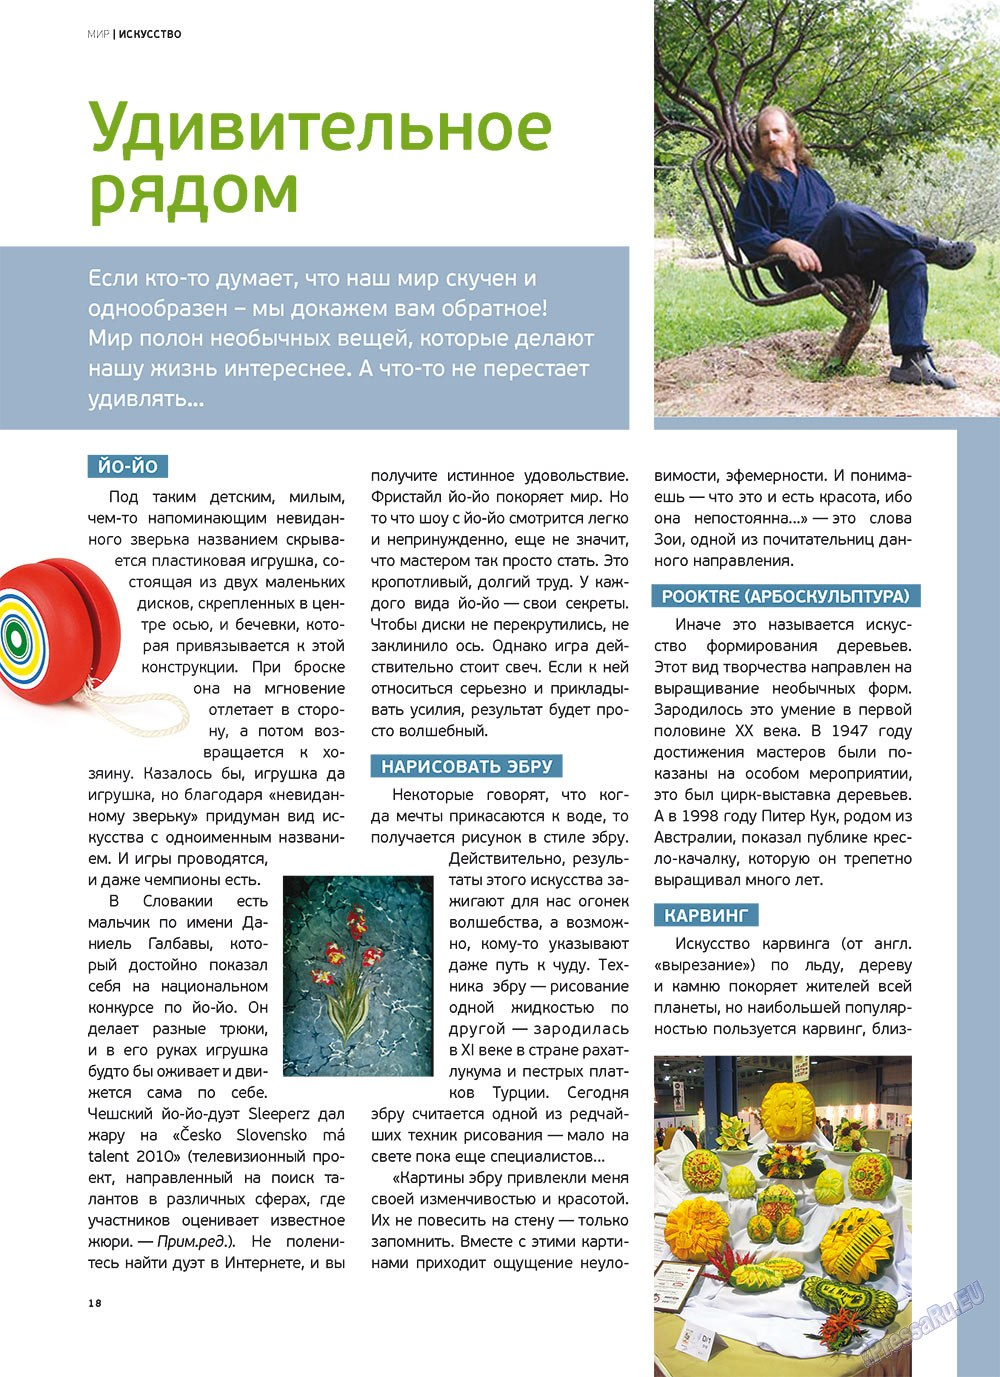 Артек (журнал). 2012 год, номер 3, стр. 20